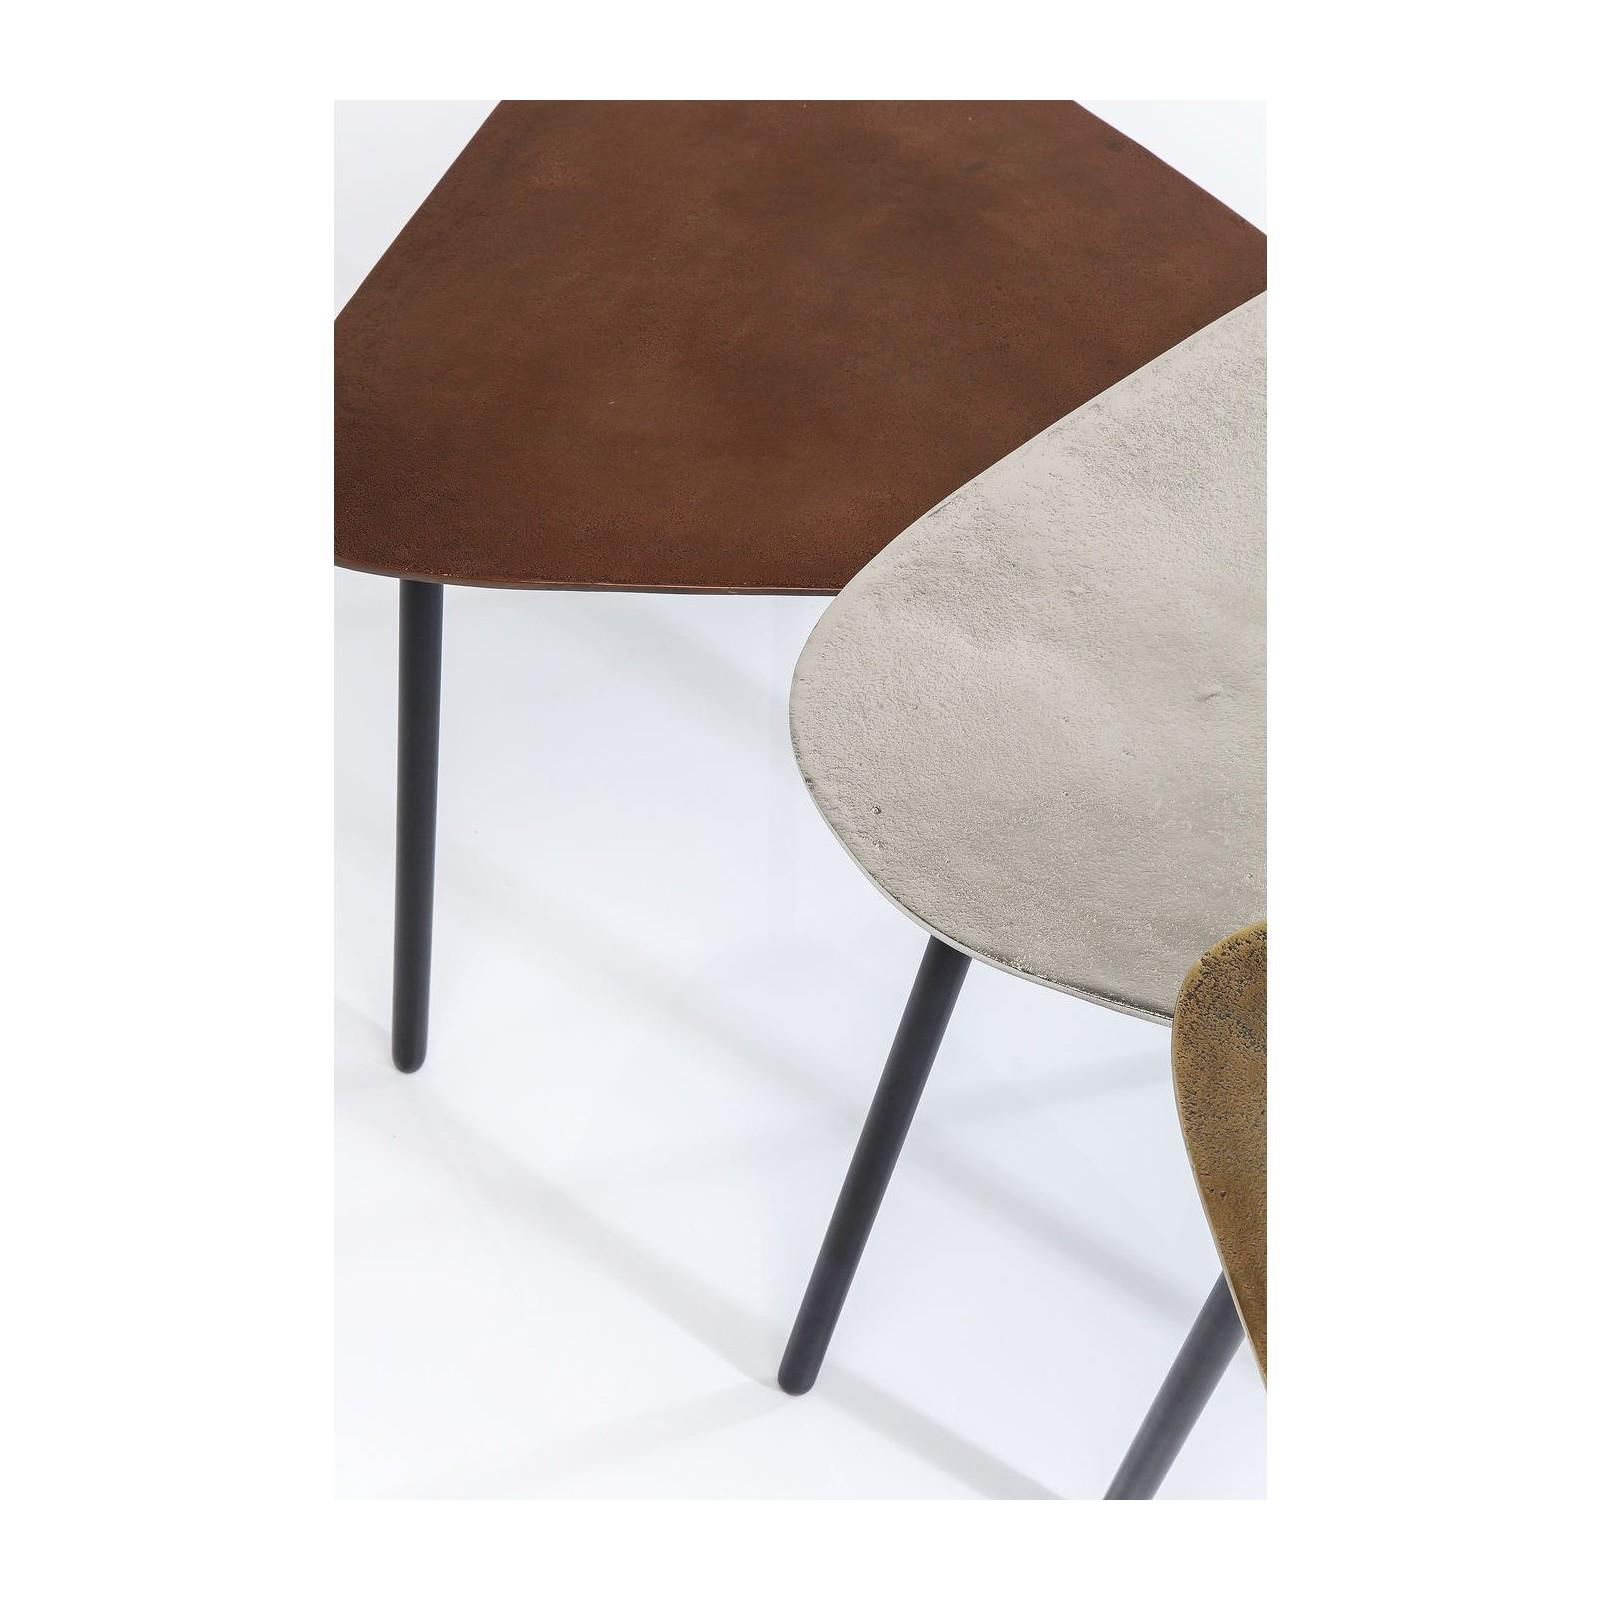 table basse forme originale table basse forme originale table basse ...